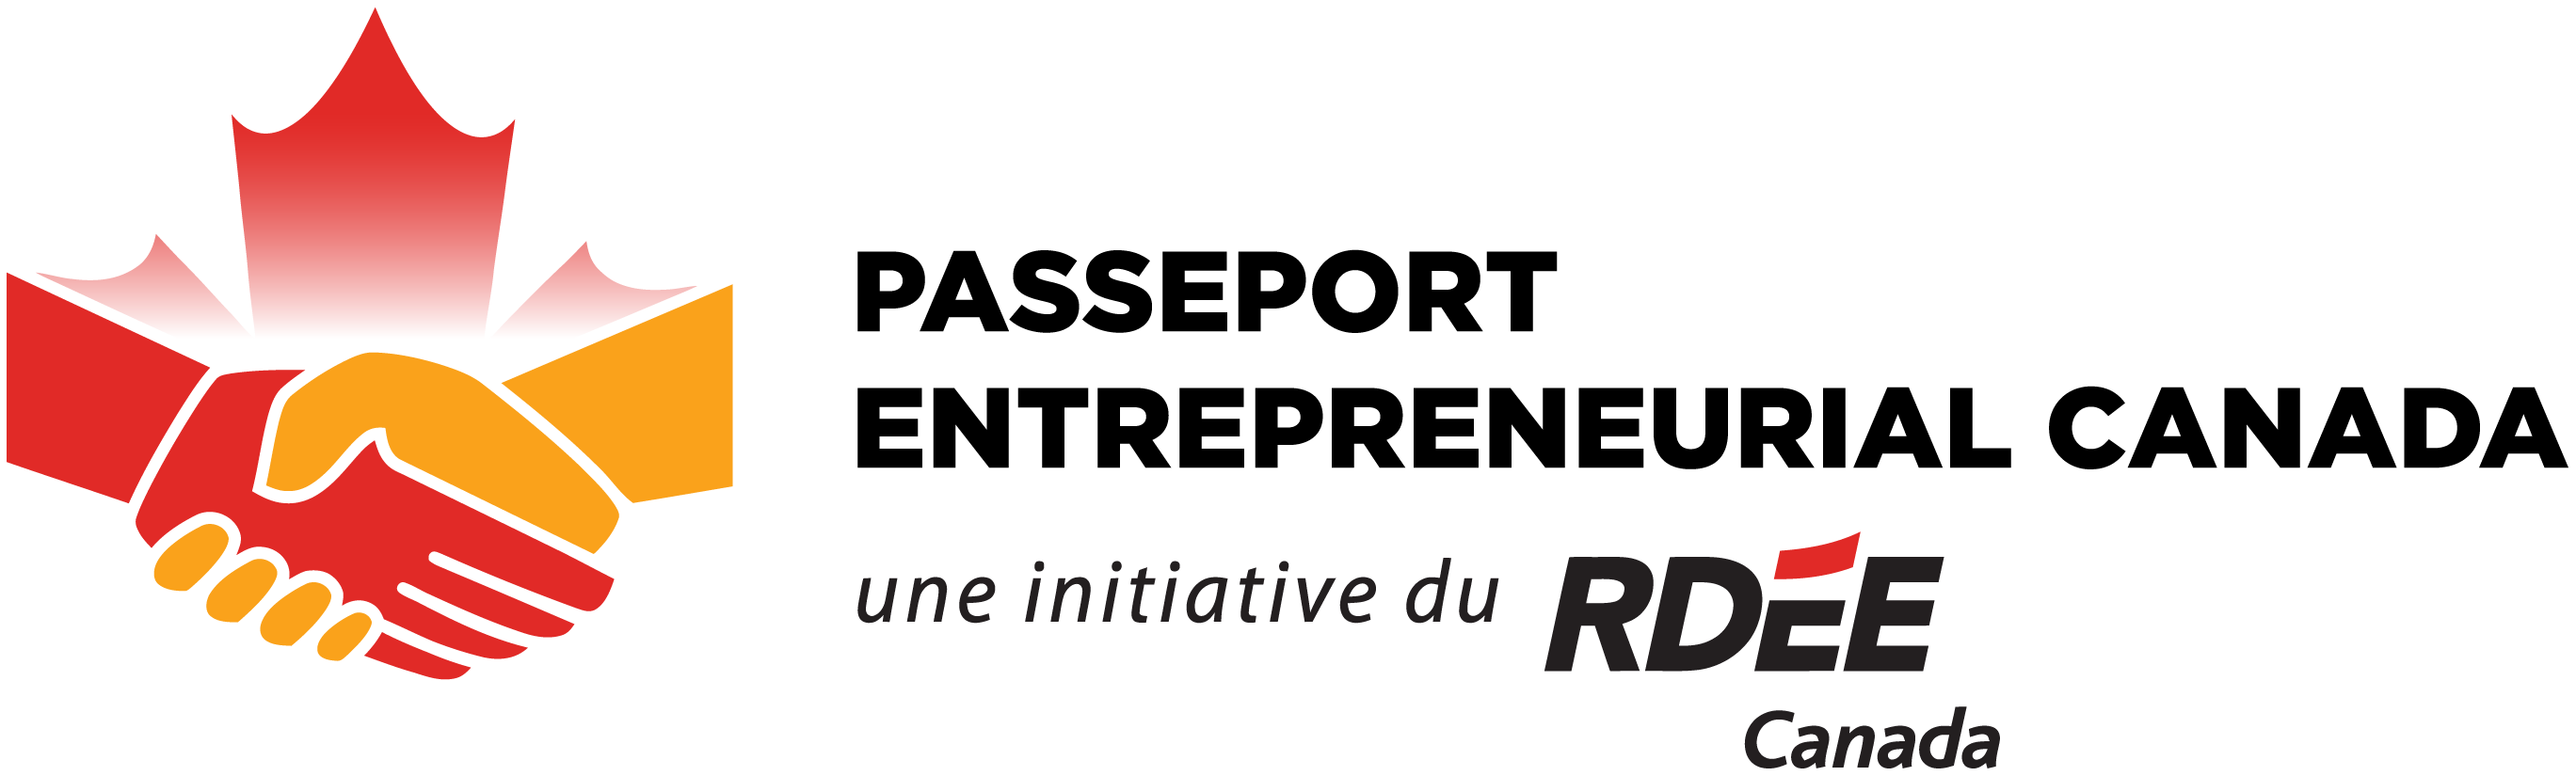 Passeport Entrepreneurial Canada